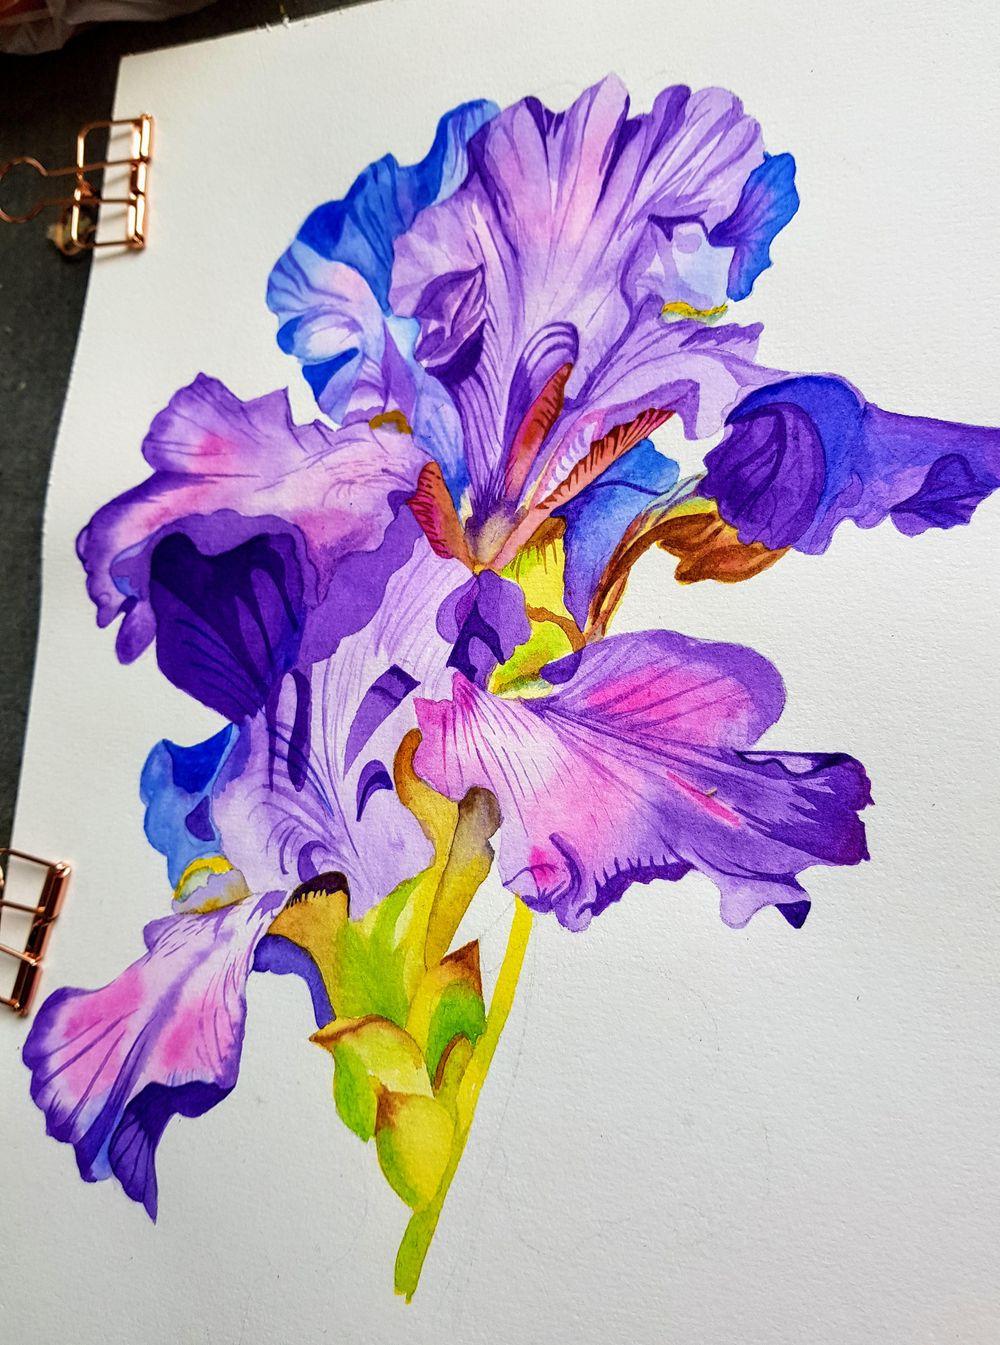 Iris flower - image 2 - student project